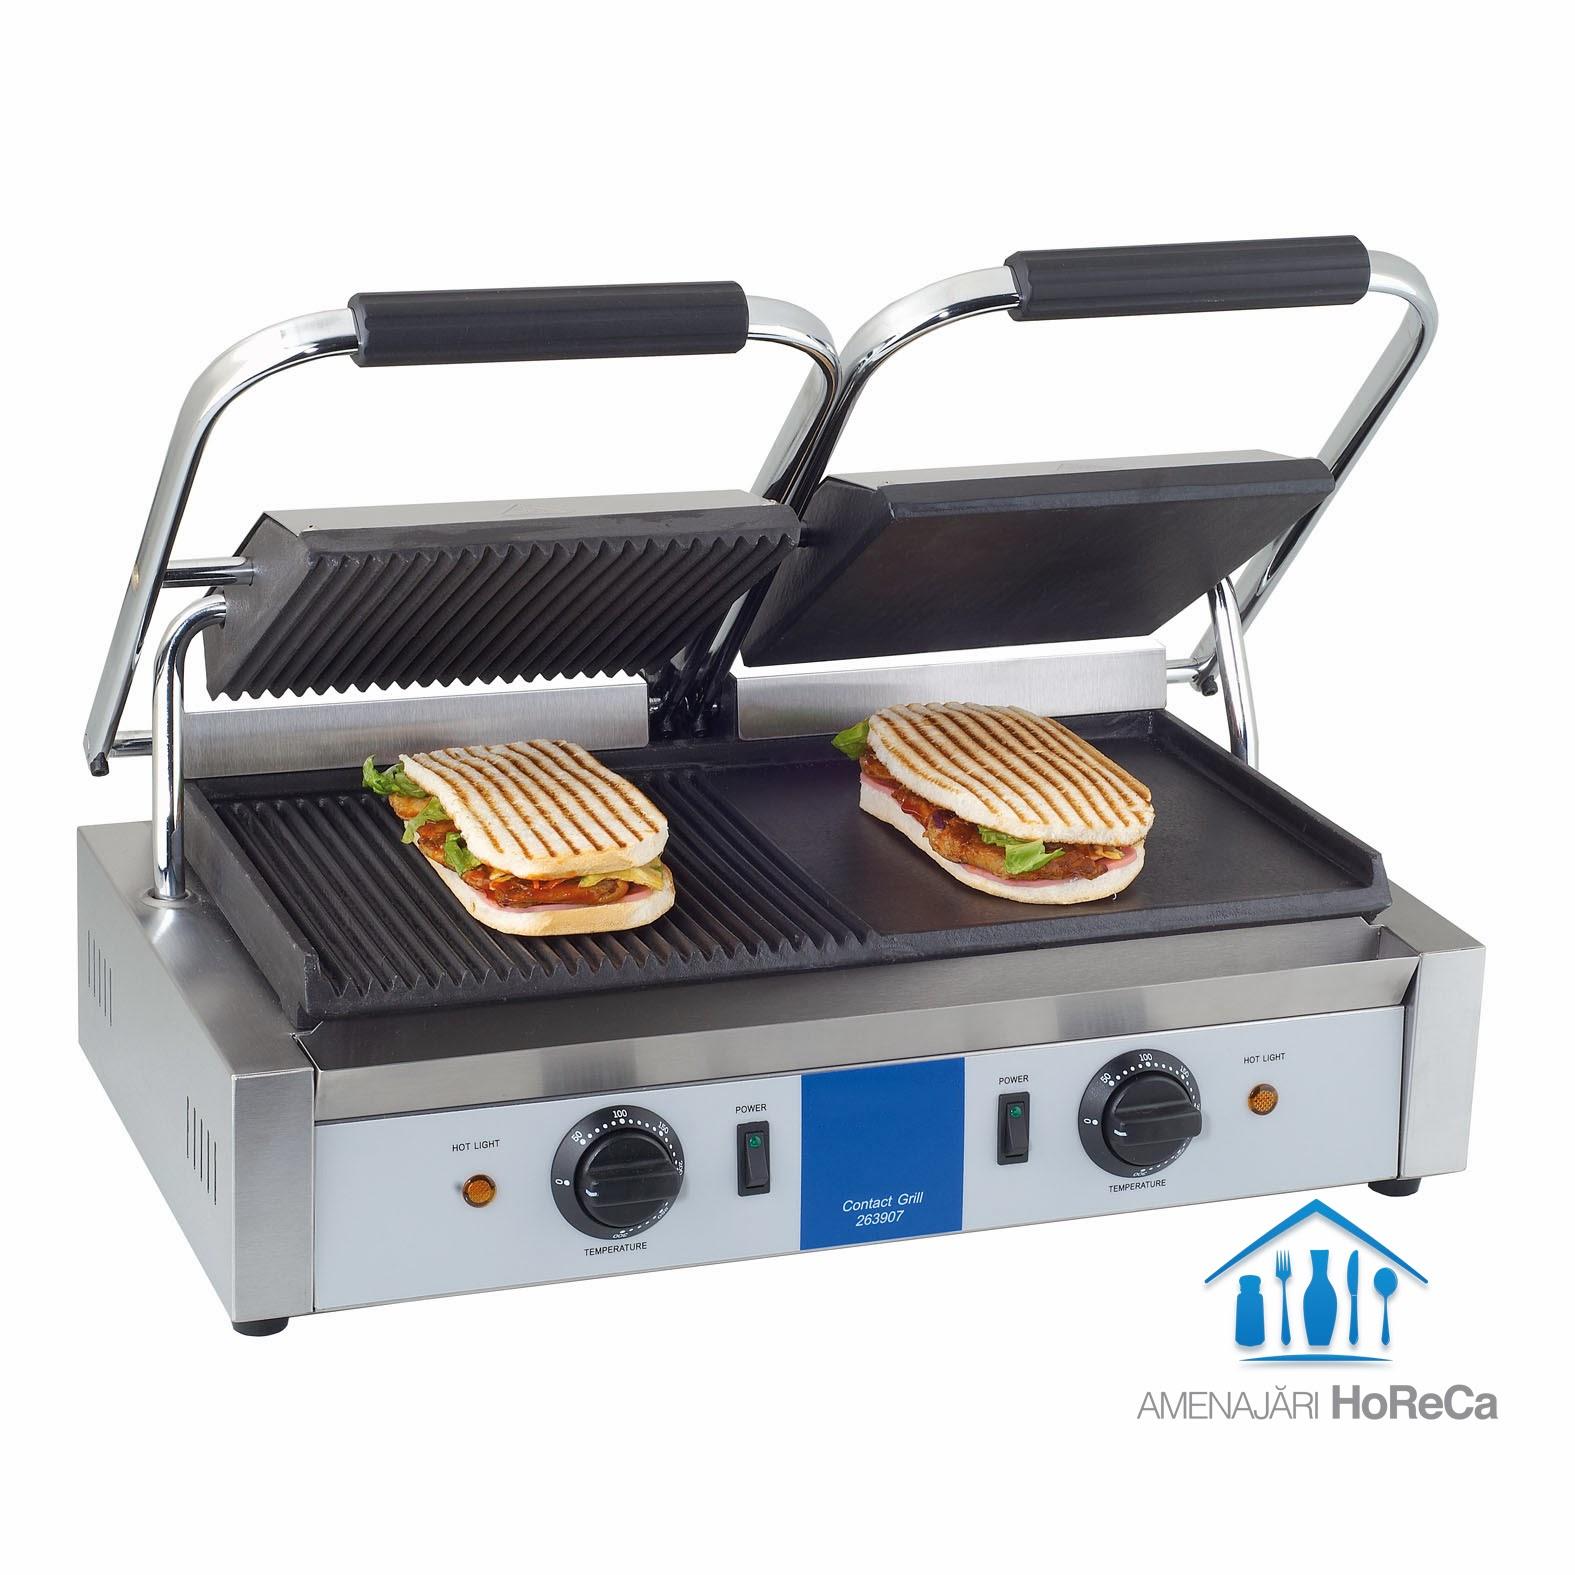 grill electric, model dublu, utilaje fast food, horeca